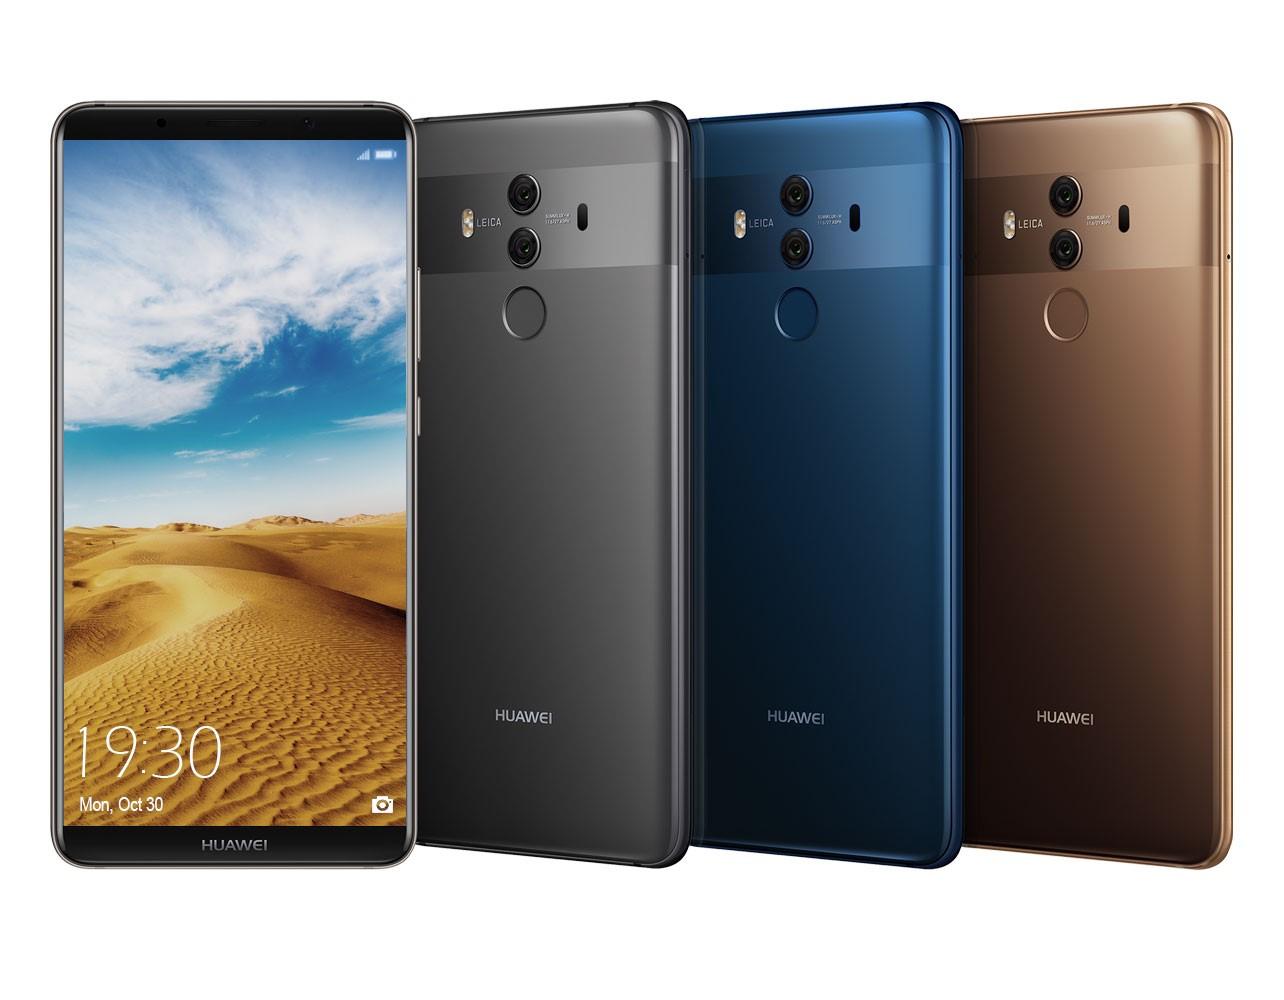 Huawei Mate 10 Pro pic